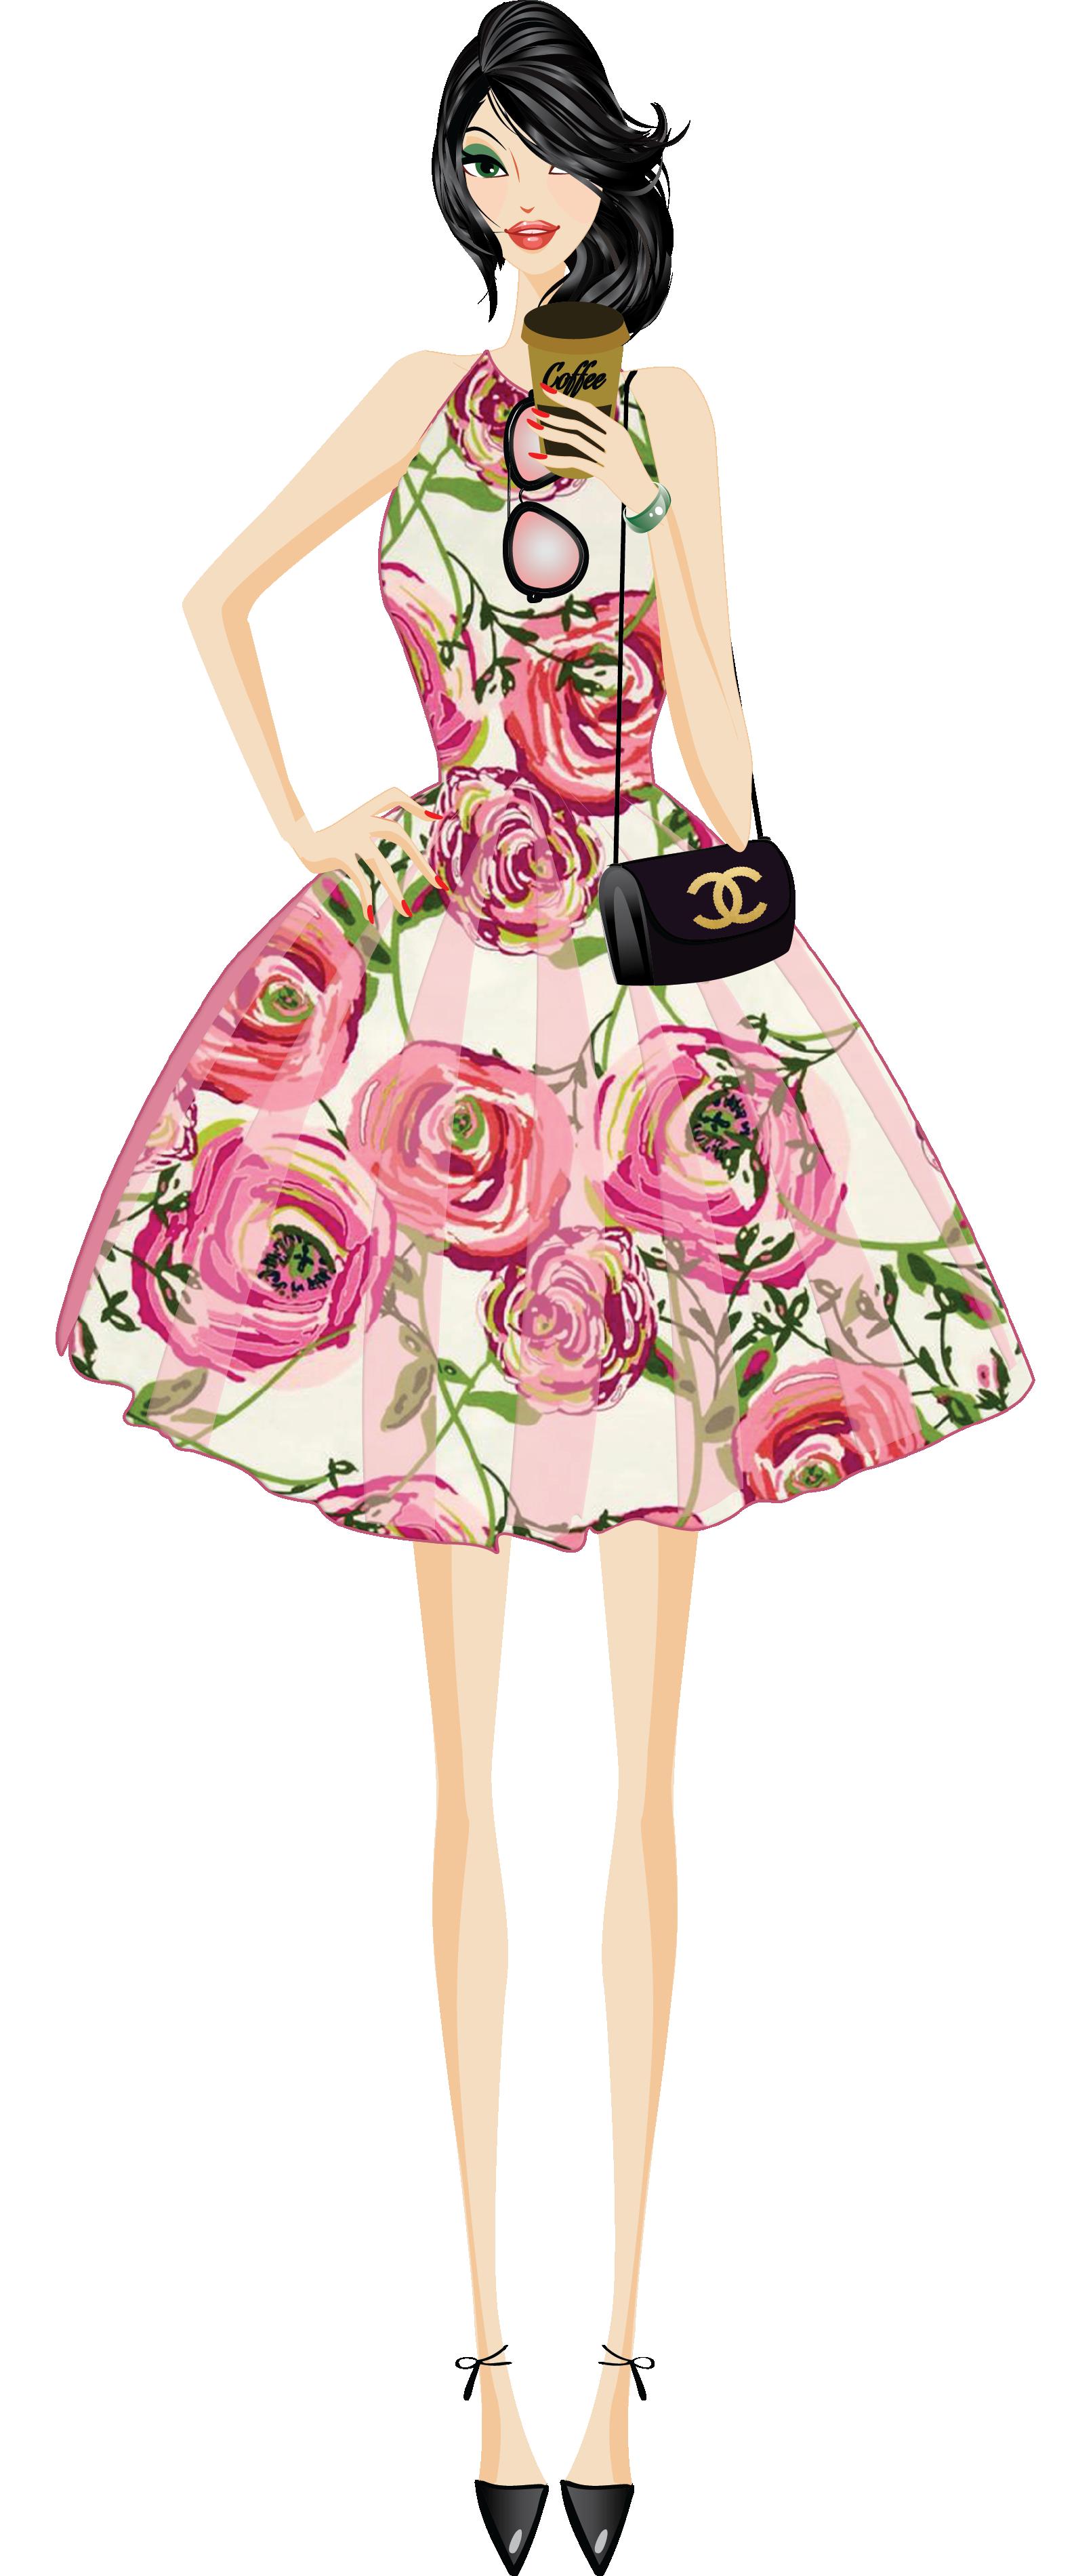 Free Fashion Clipart: Fashion Girl Clip Art Digital Paper Paper Doll Shoes